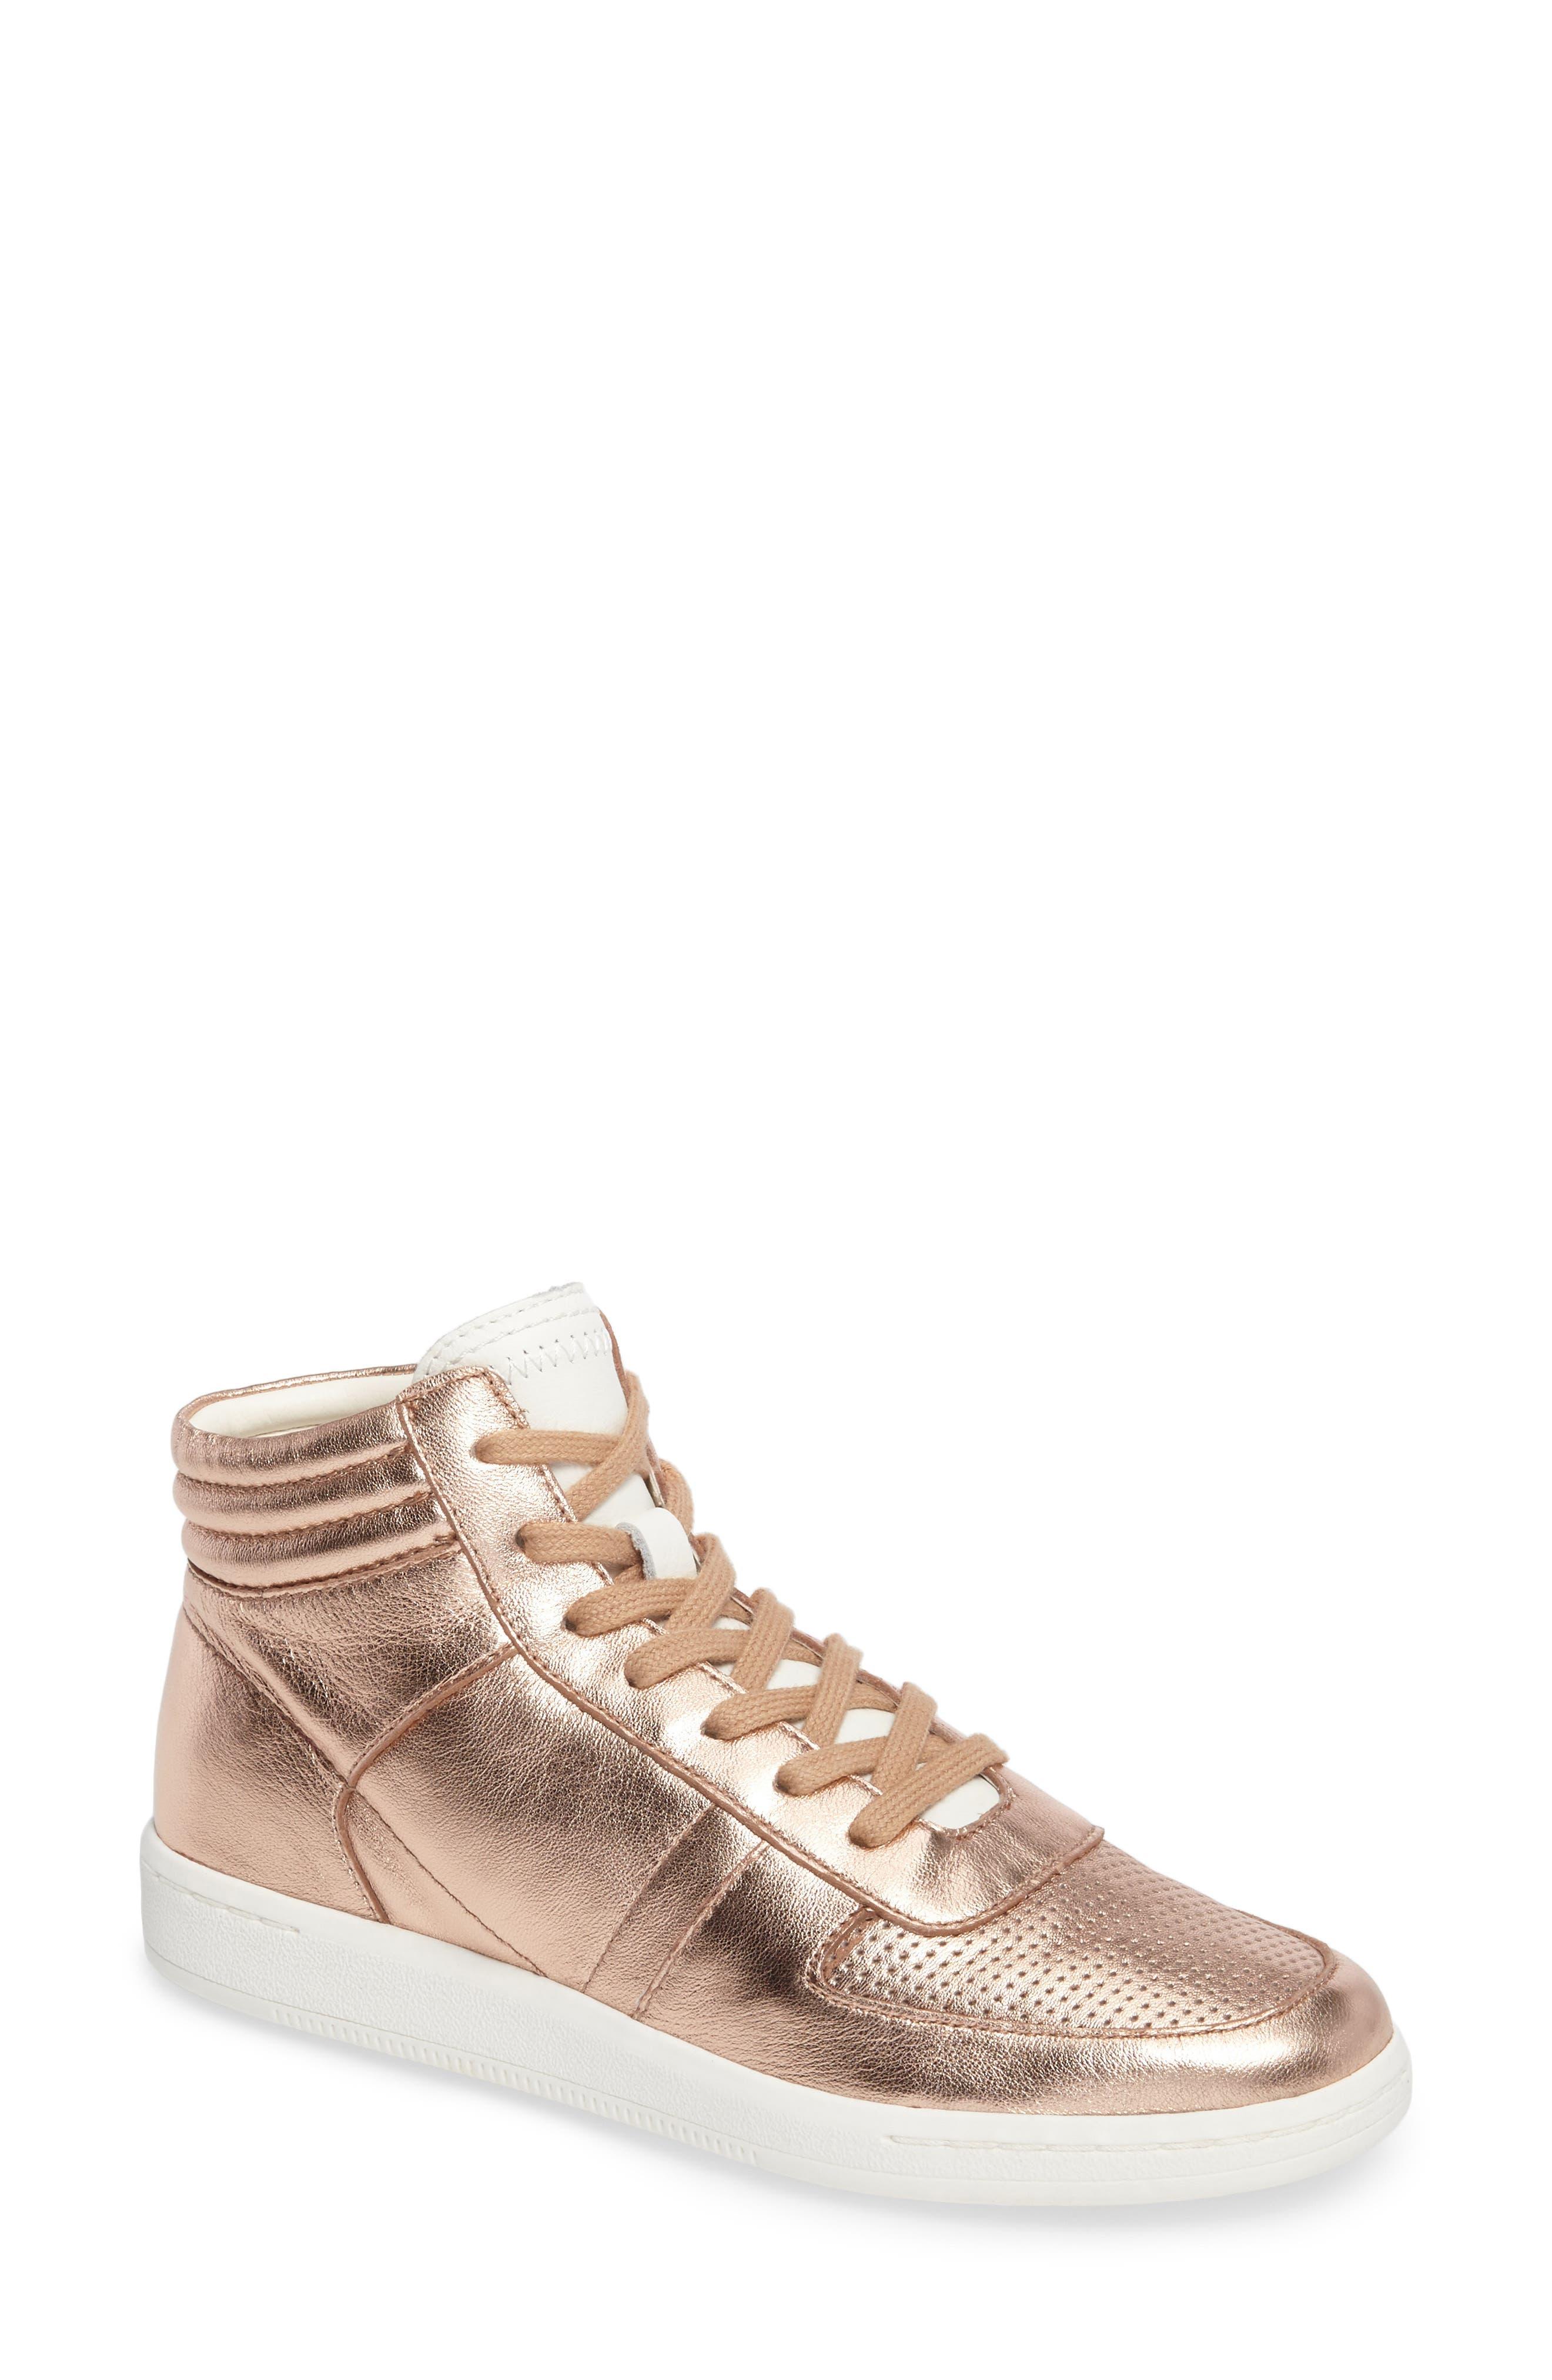 Main Image - Dolce Vita Nate High Top Sneaker (Women)